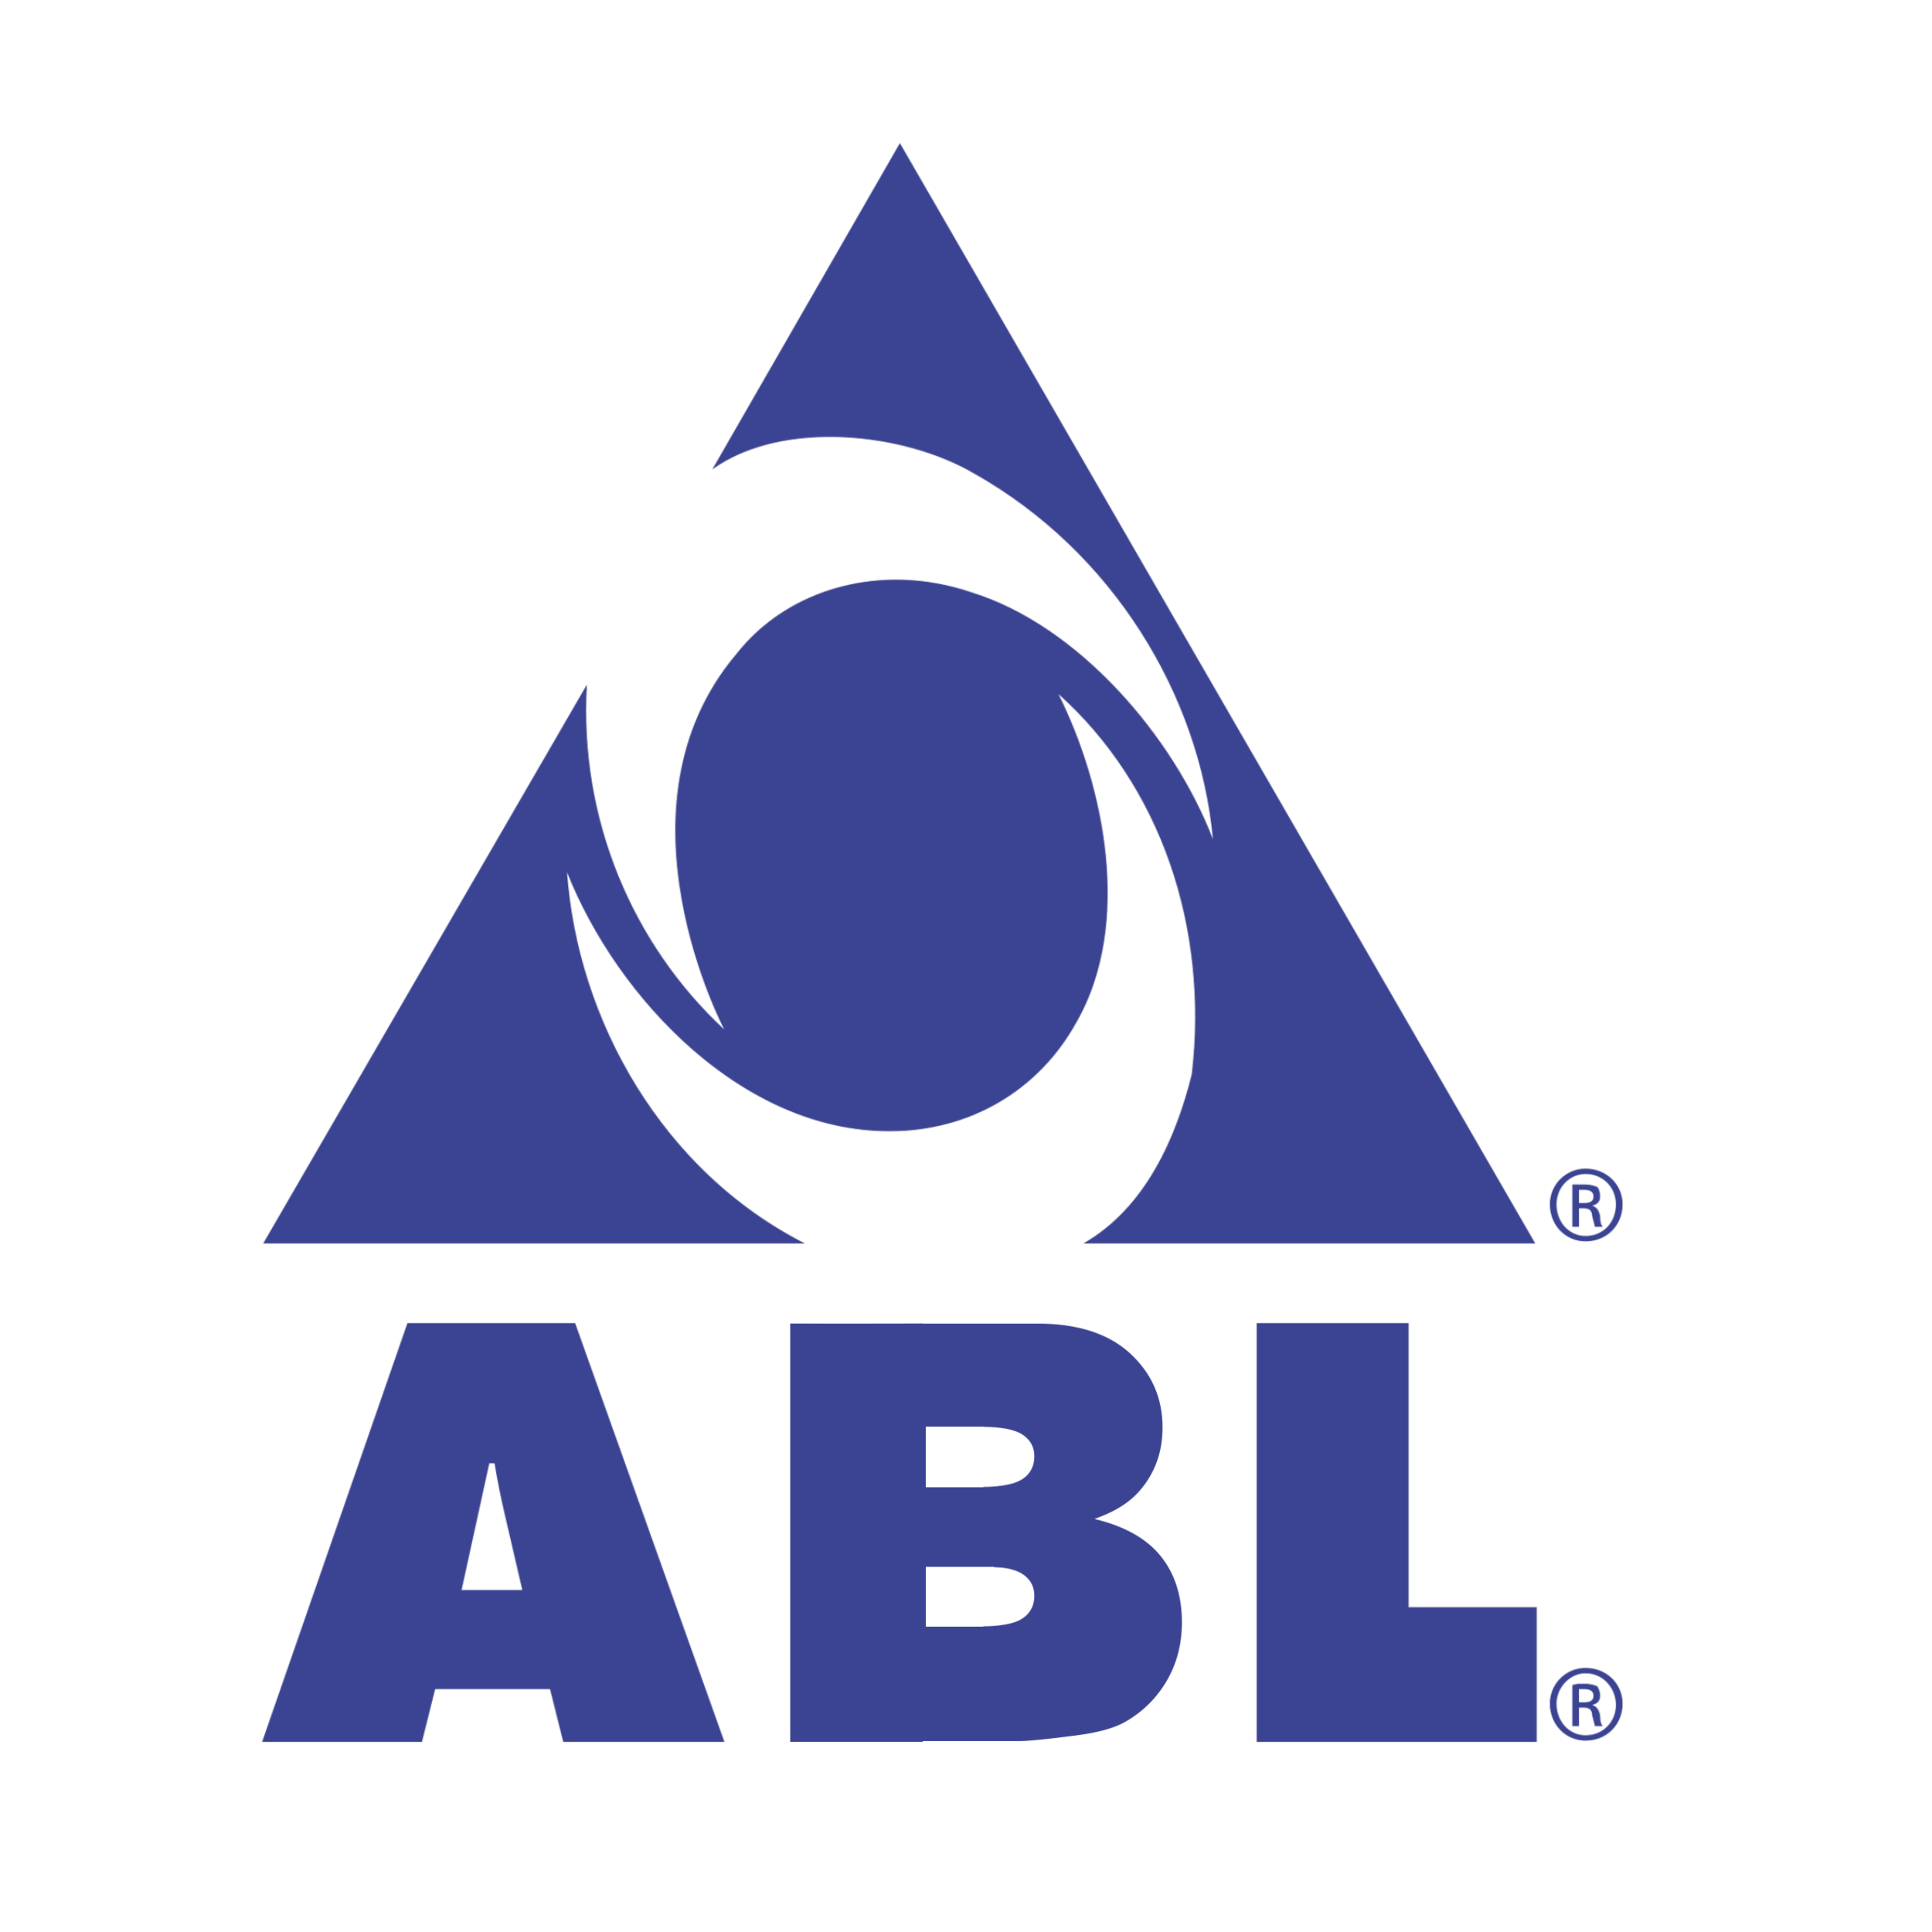 abl logo_small.png